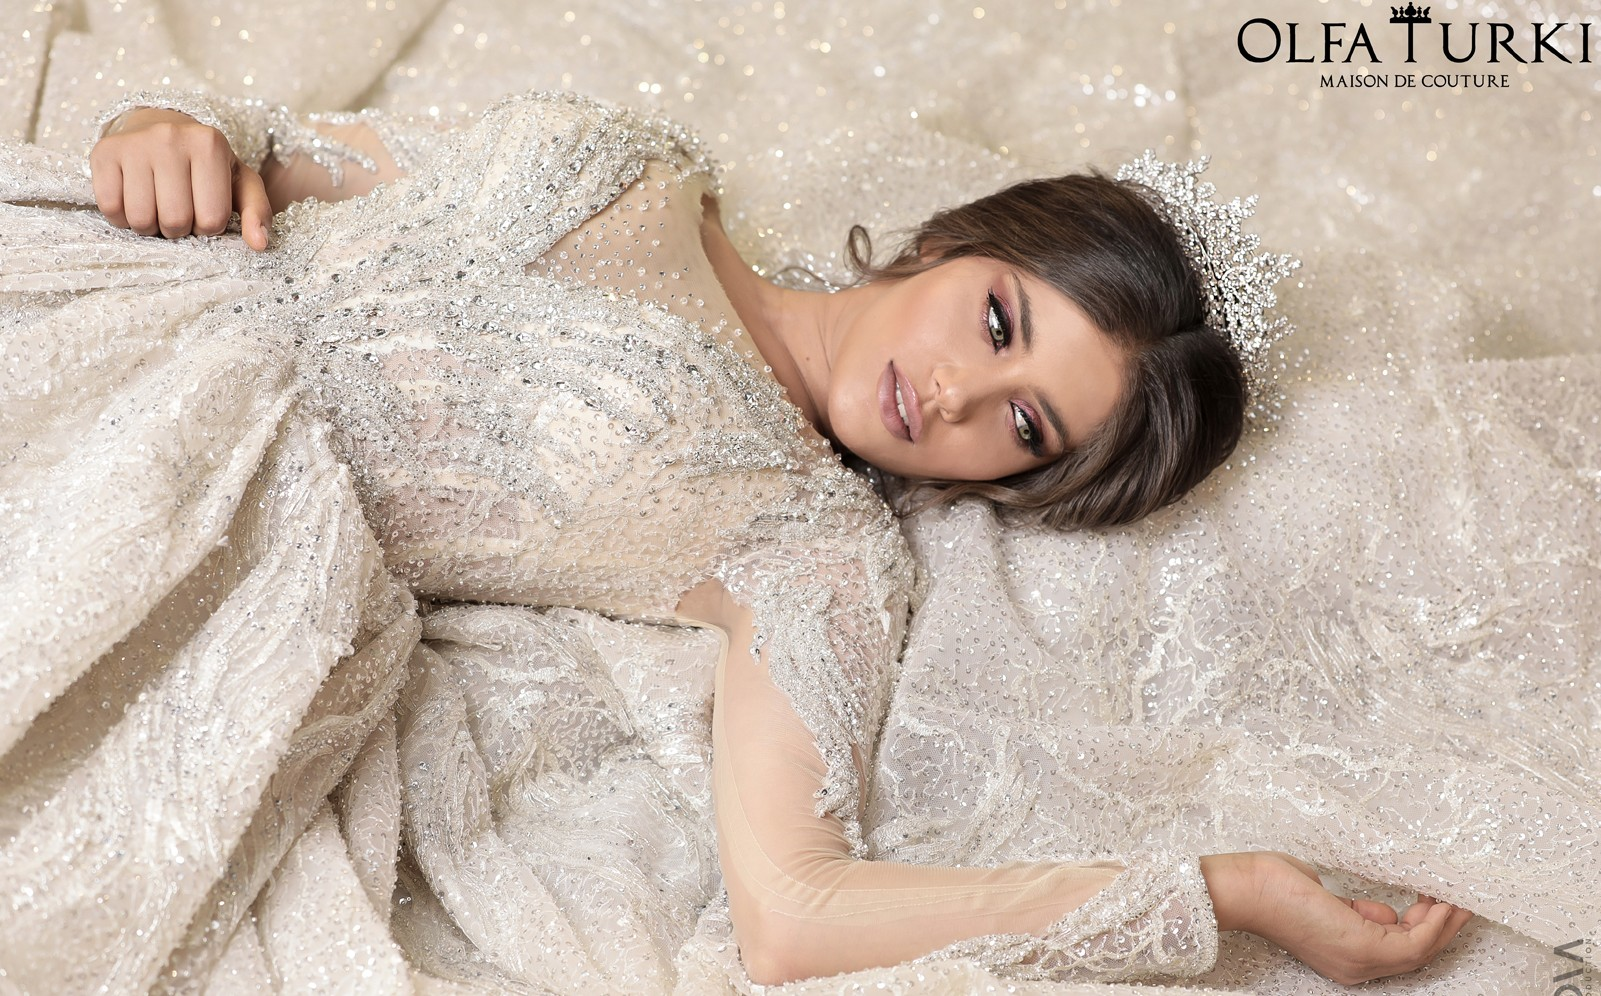 olfa-turki-bride